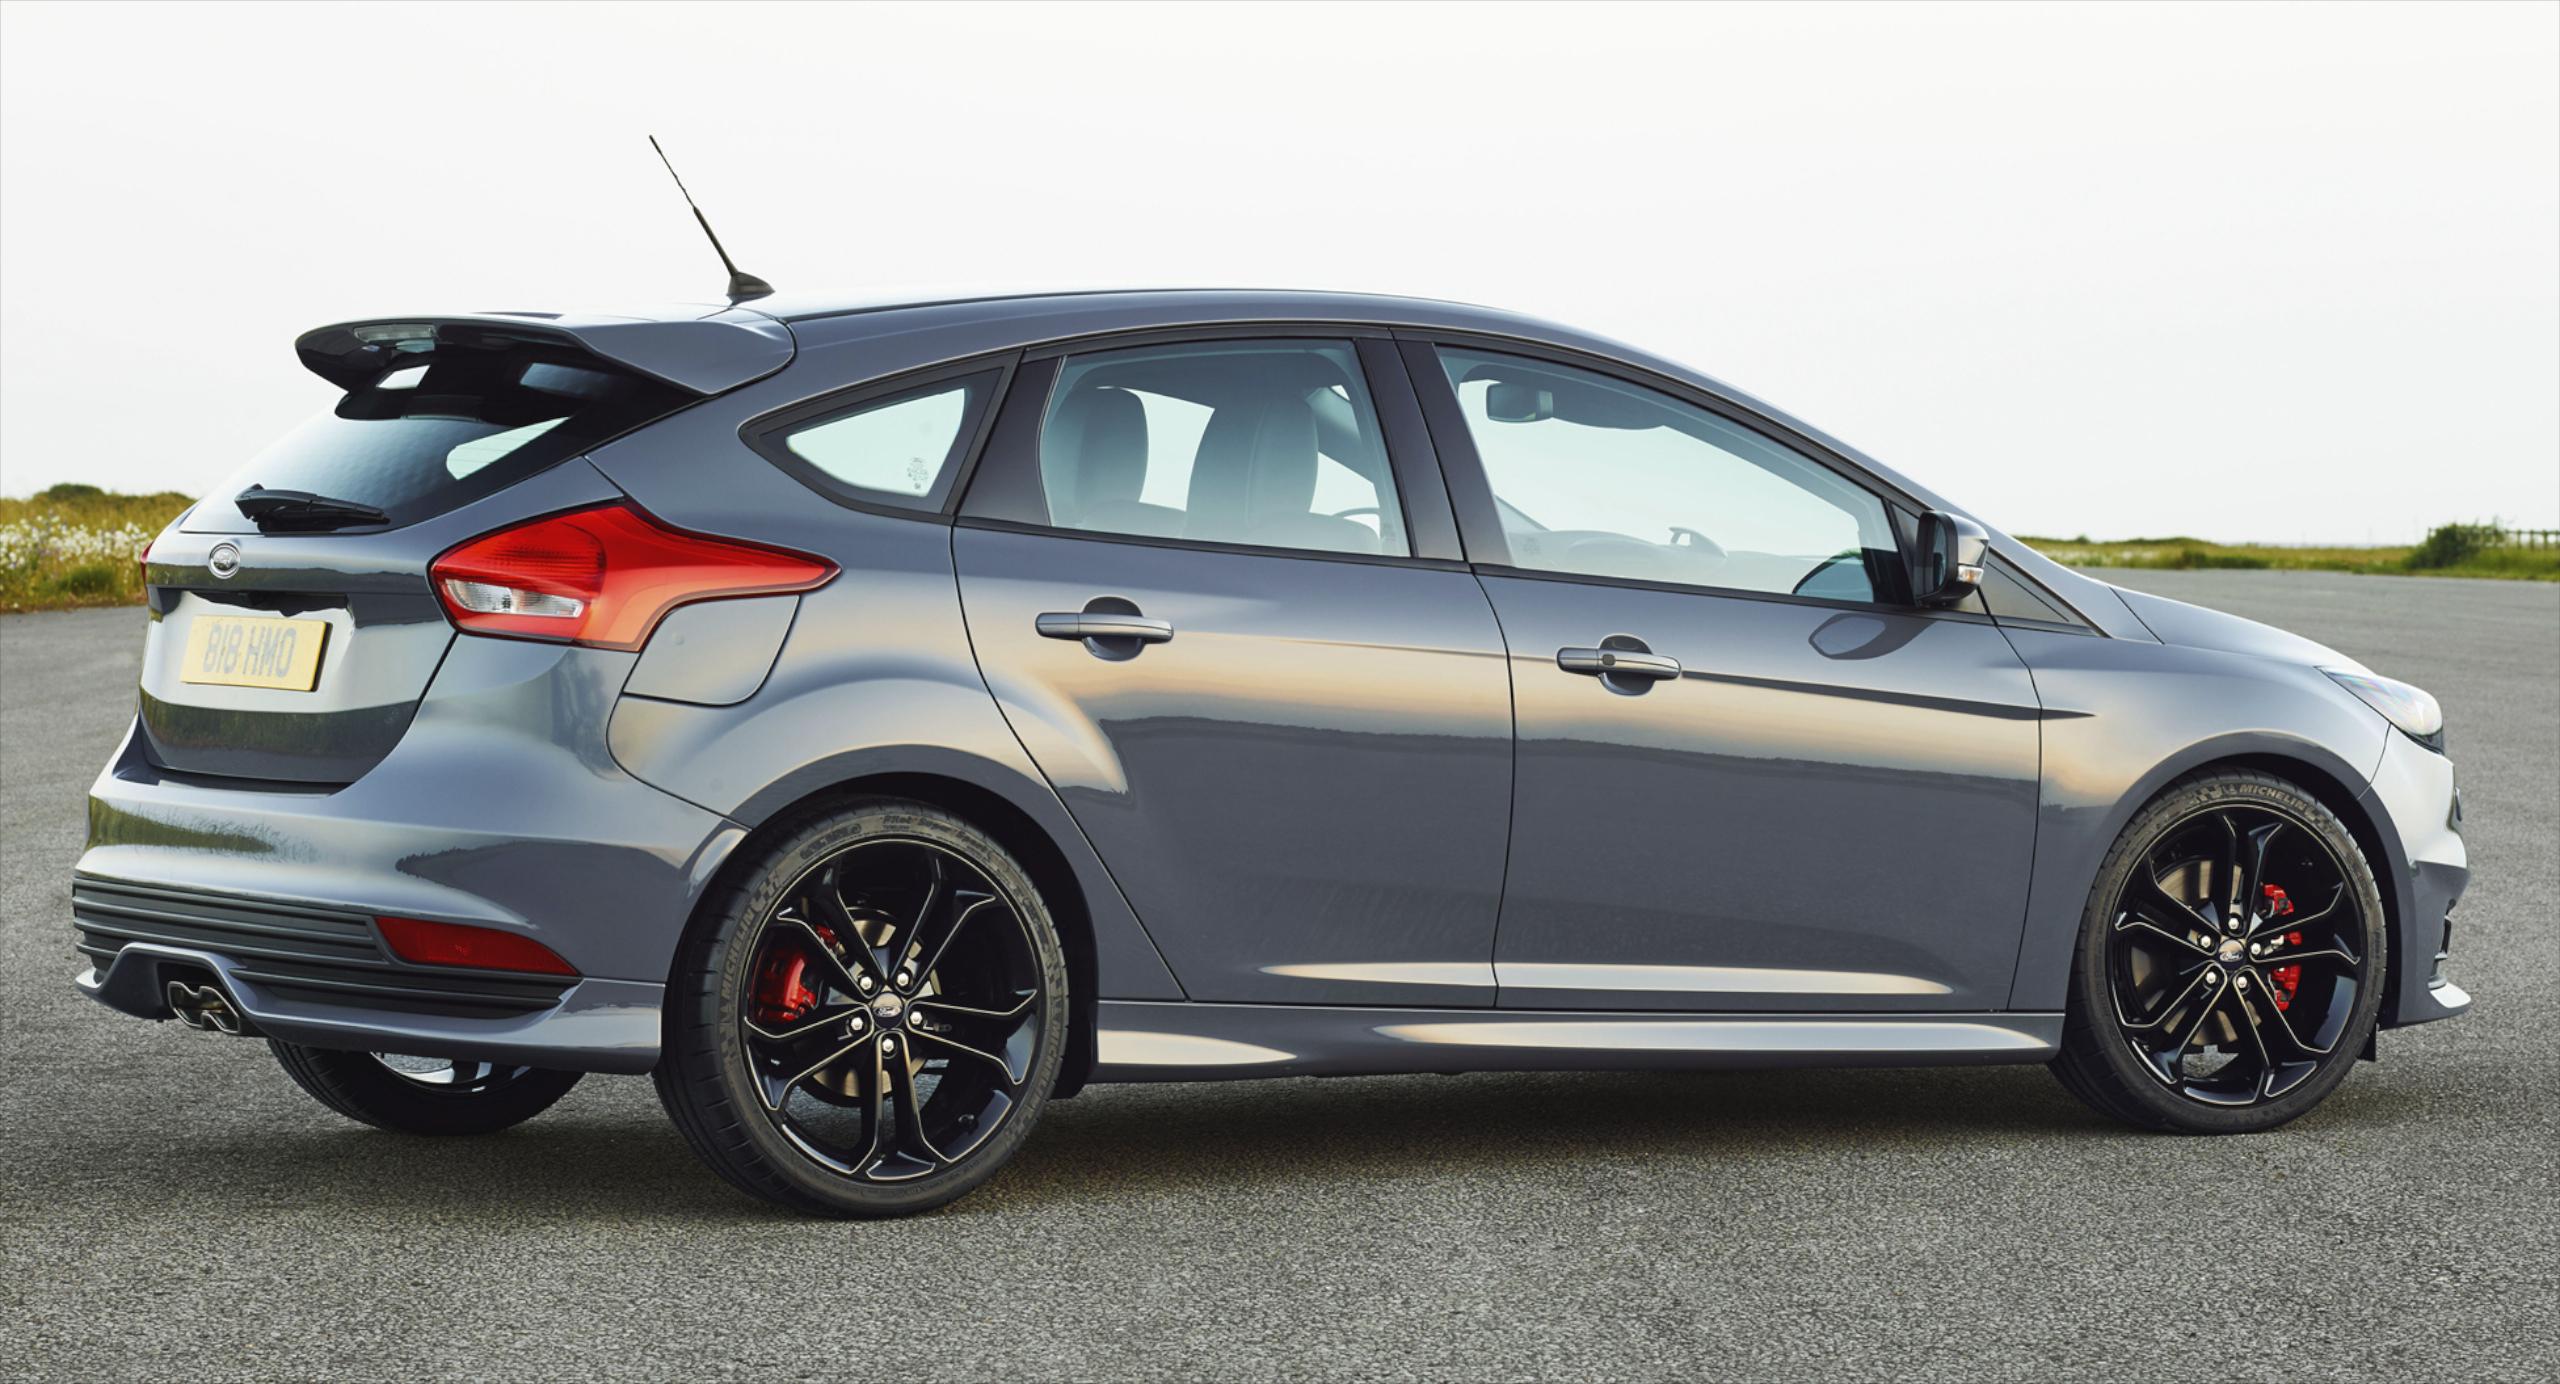 name c346 ford focus st facelift 16jpg views - 2015 Ford Focus St Magnetic Metallic